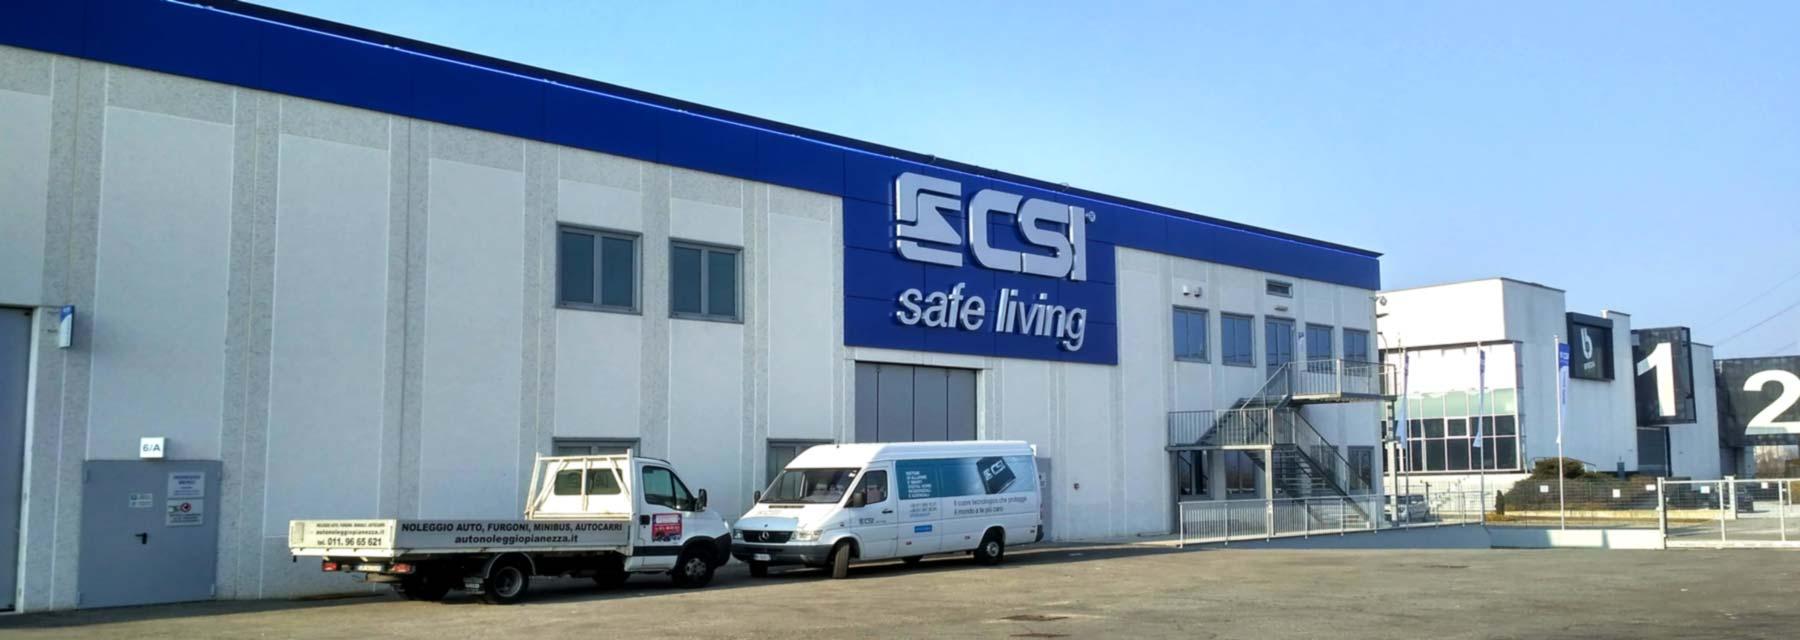 csi-safe-living-maxi-insegne-pannellature-insegne-italia